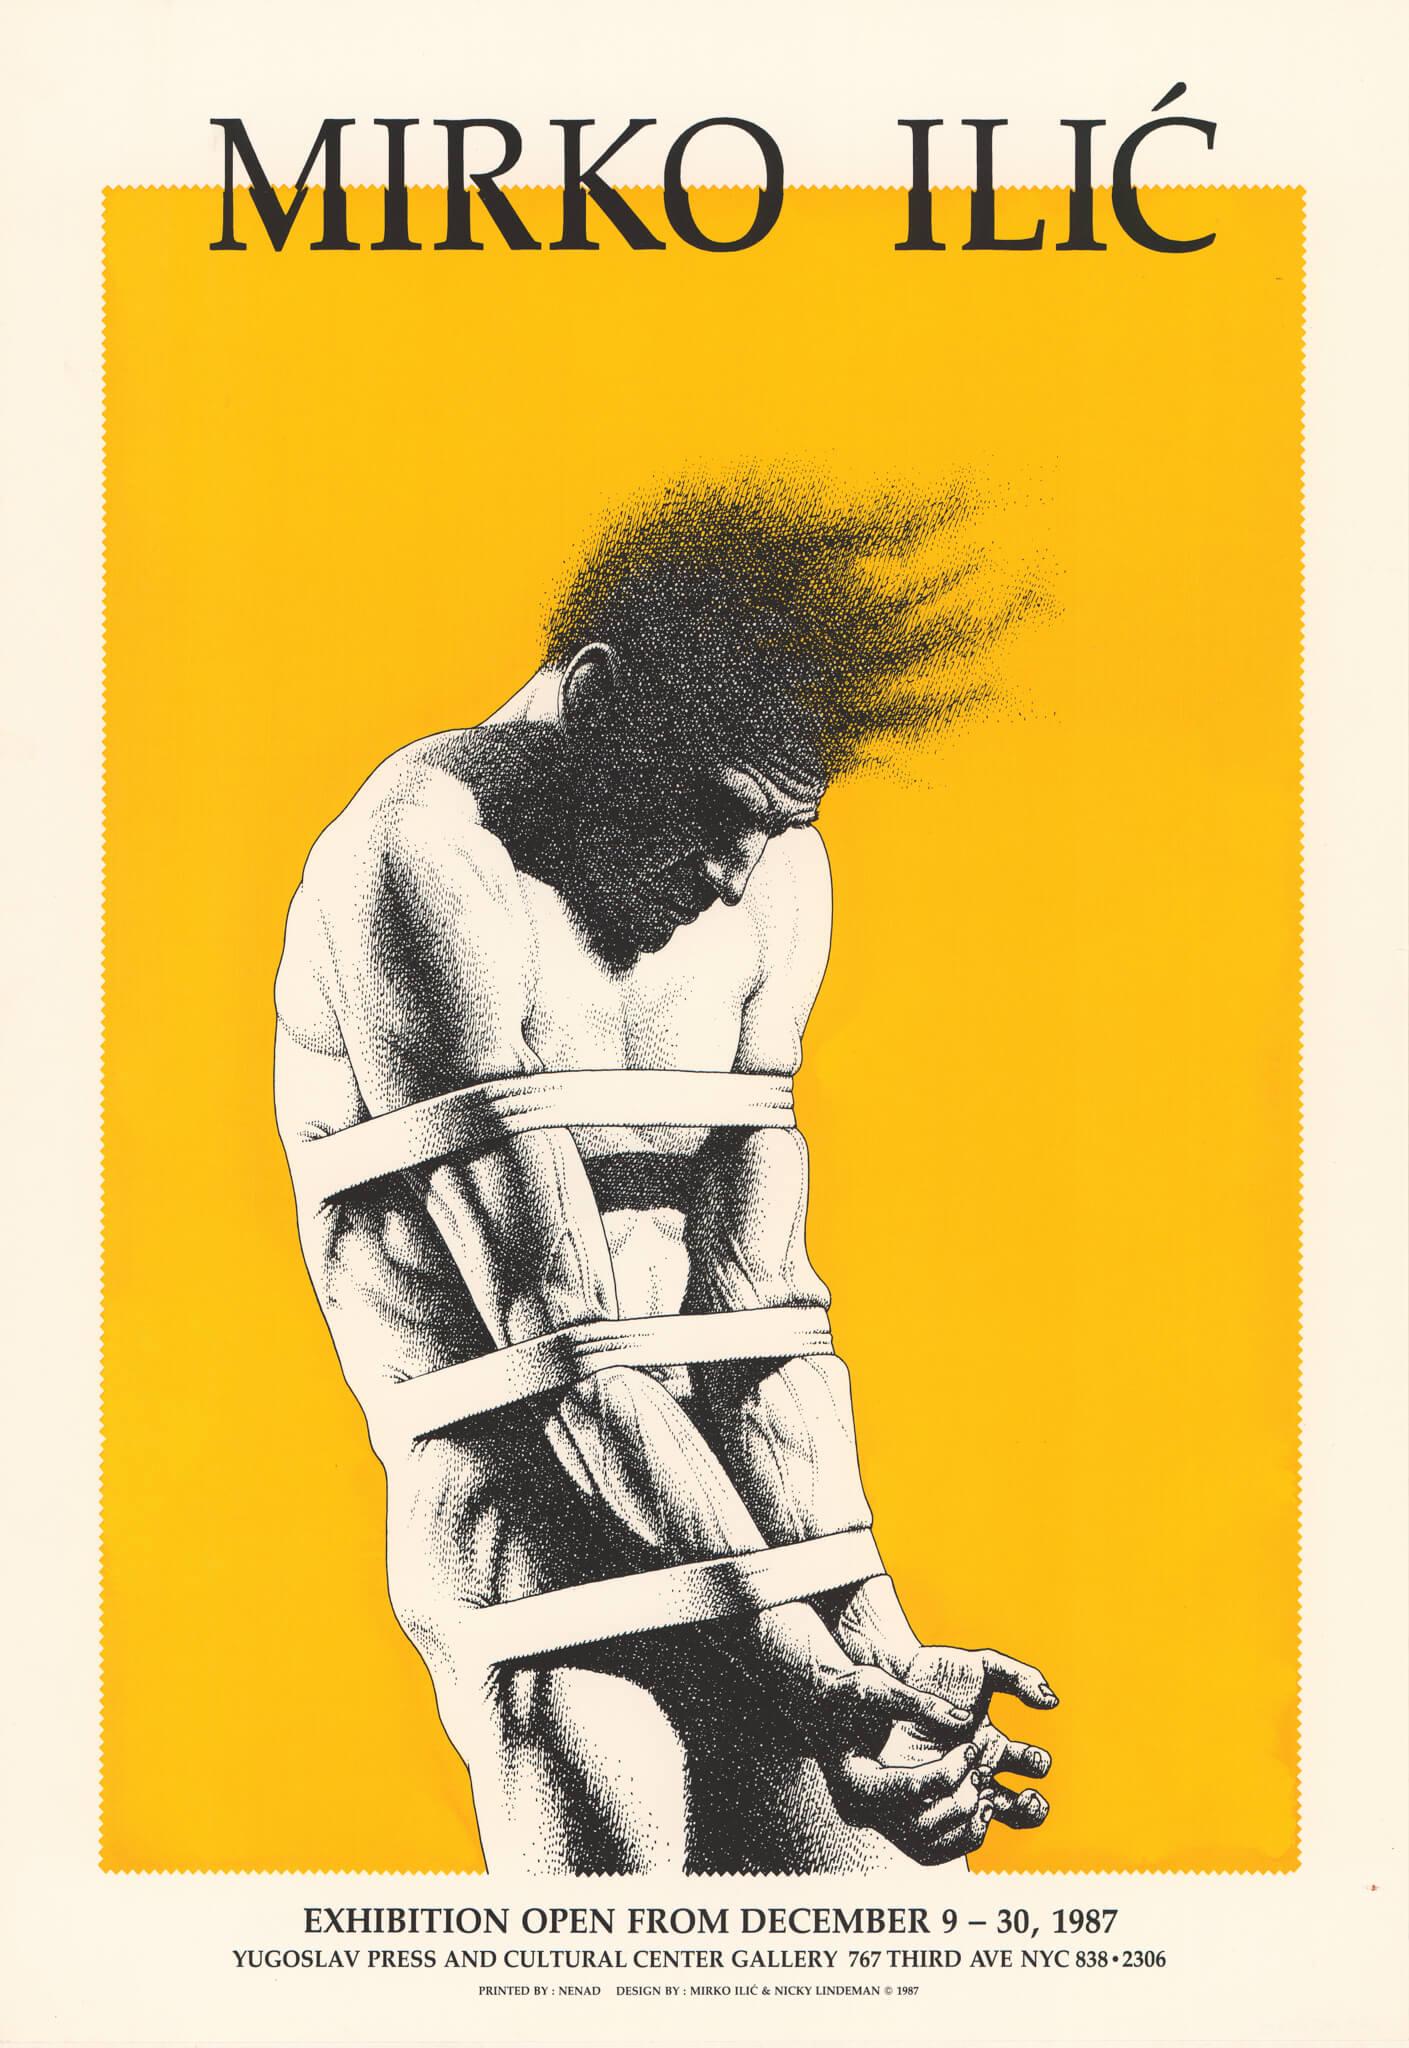 """Mirko Ilić"" (1987.; Mirko Ilić, Nicky Lindeman), plakat za izložbu radova Mirka Ilića 1987. godine u galeriji Centra za jugoslavenski tisak i kulturu u New Yorku."